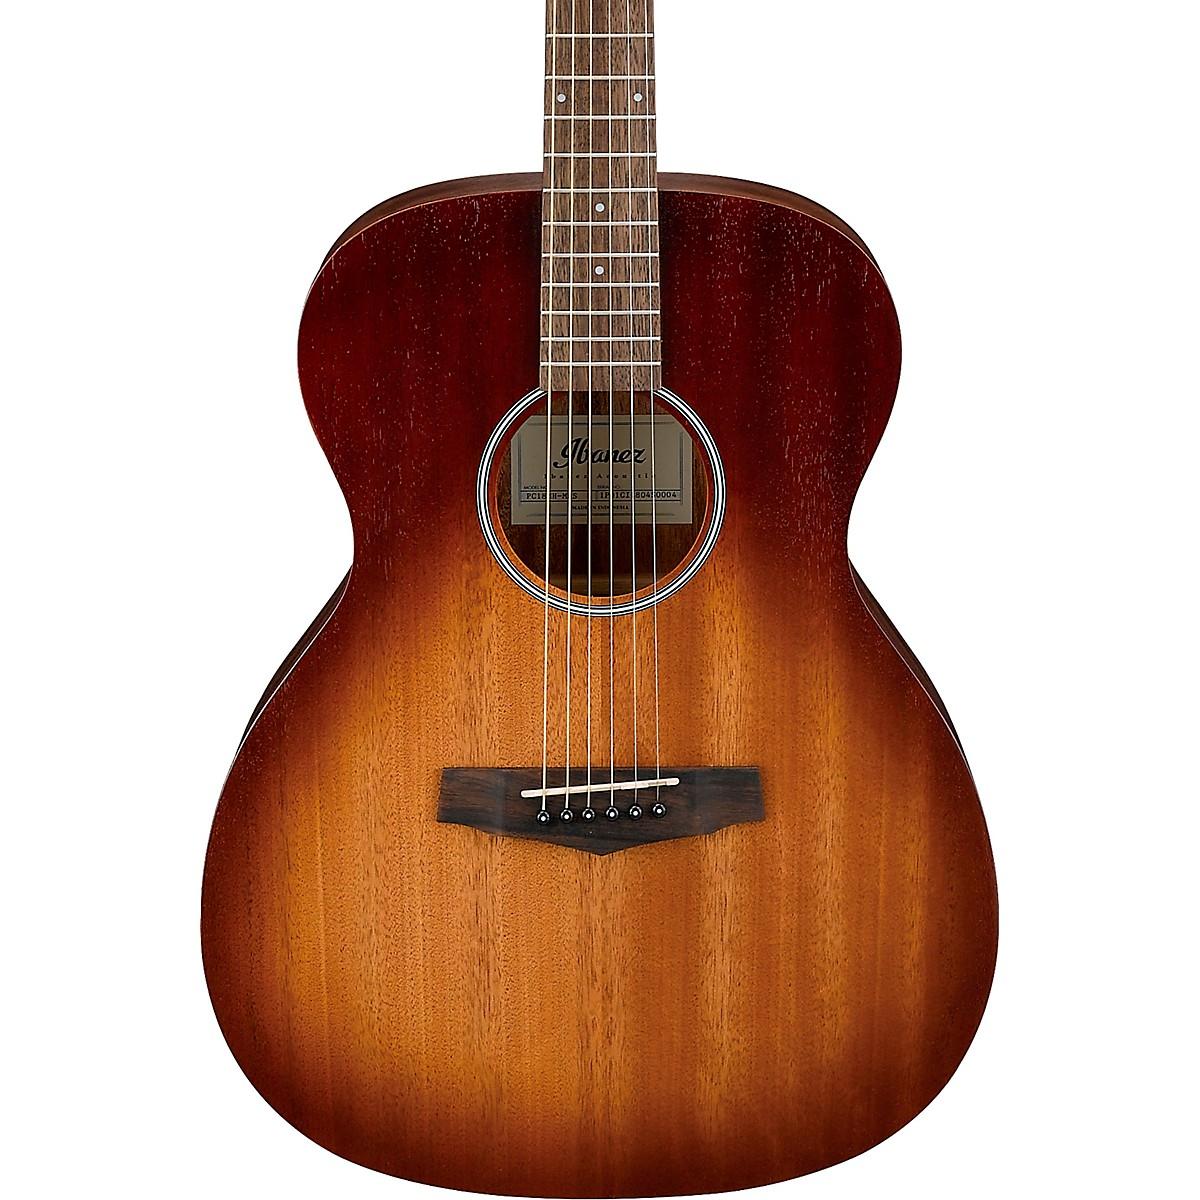 Ibanez PC18MHMHS Mahogany Grand Concert Acoustic Guitar